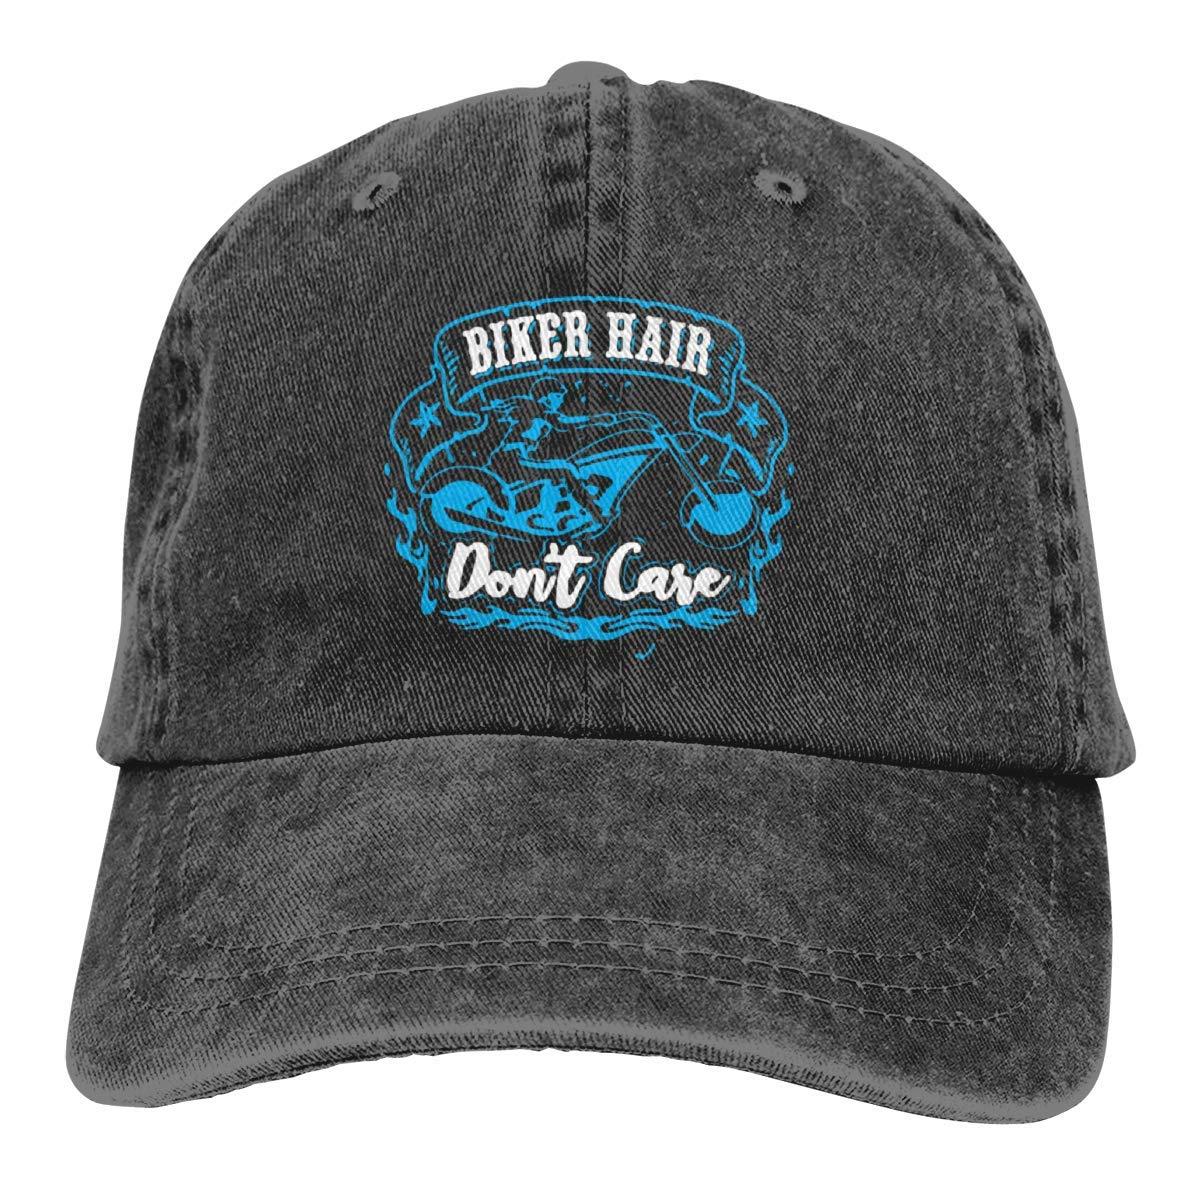 large-scale Biker Hair Don't Care Washed Denim Hat Adjustable Unisex Dad Baseball Caps